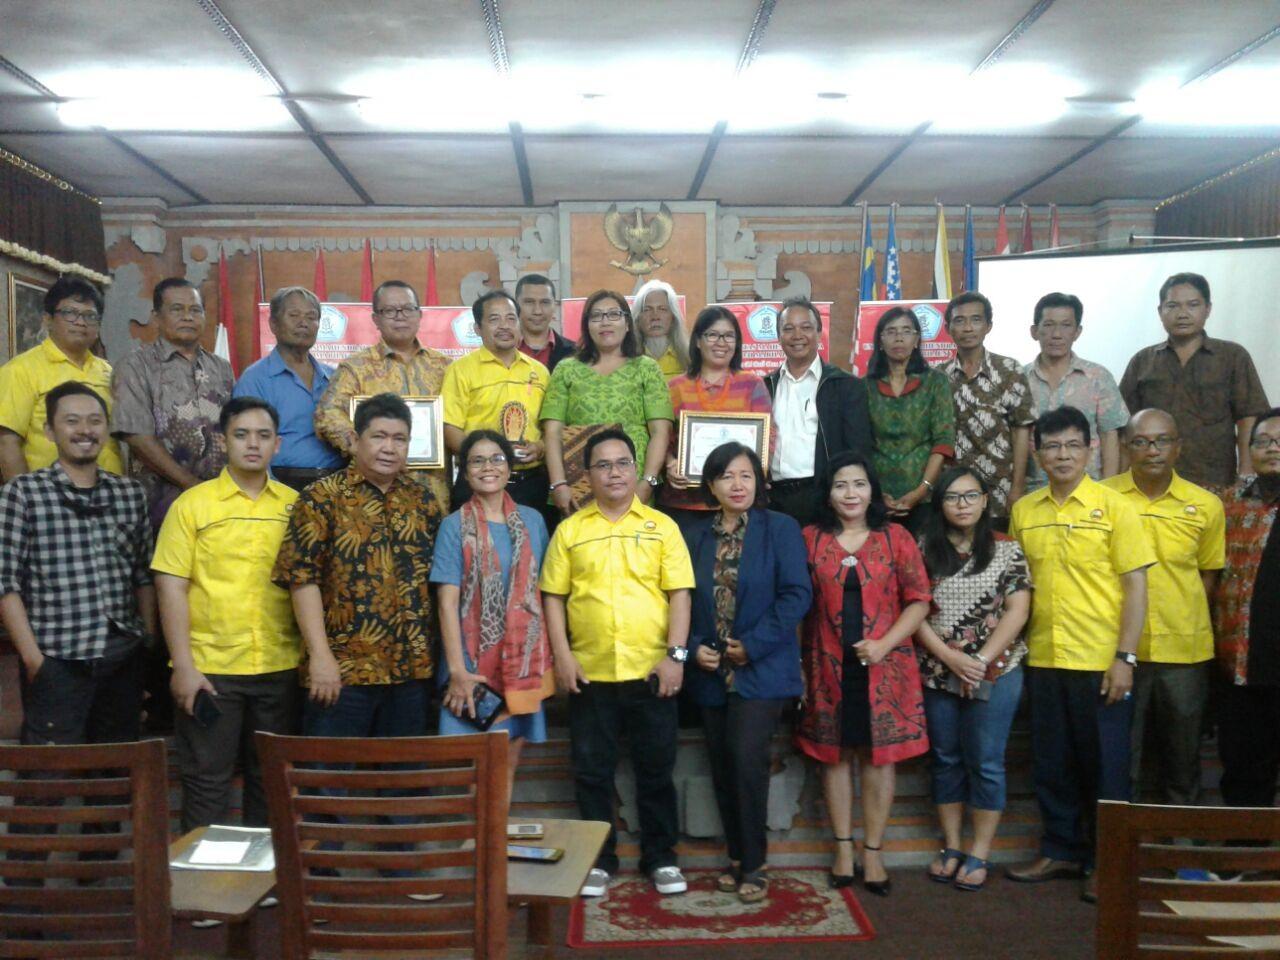 CERDAS BERSOSMED DALAM PILKADA, MELAWAN ISU SARA & HOAX BERSAMA PERSATUAN WARTAWAN KRISTEN INDONESIA